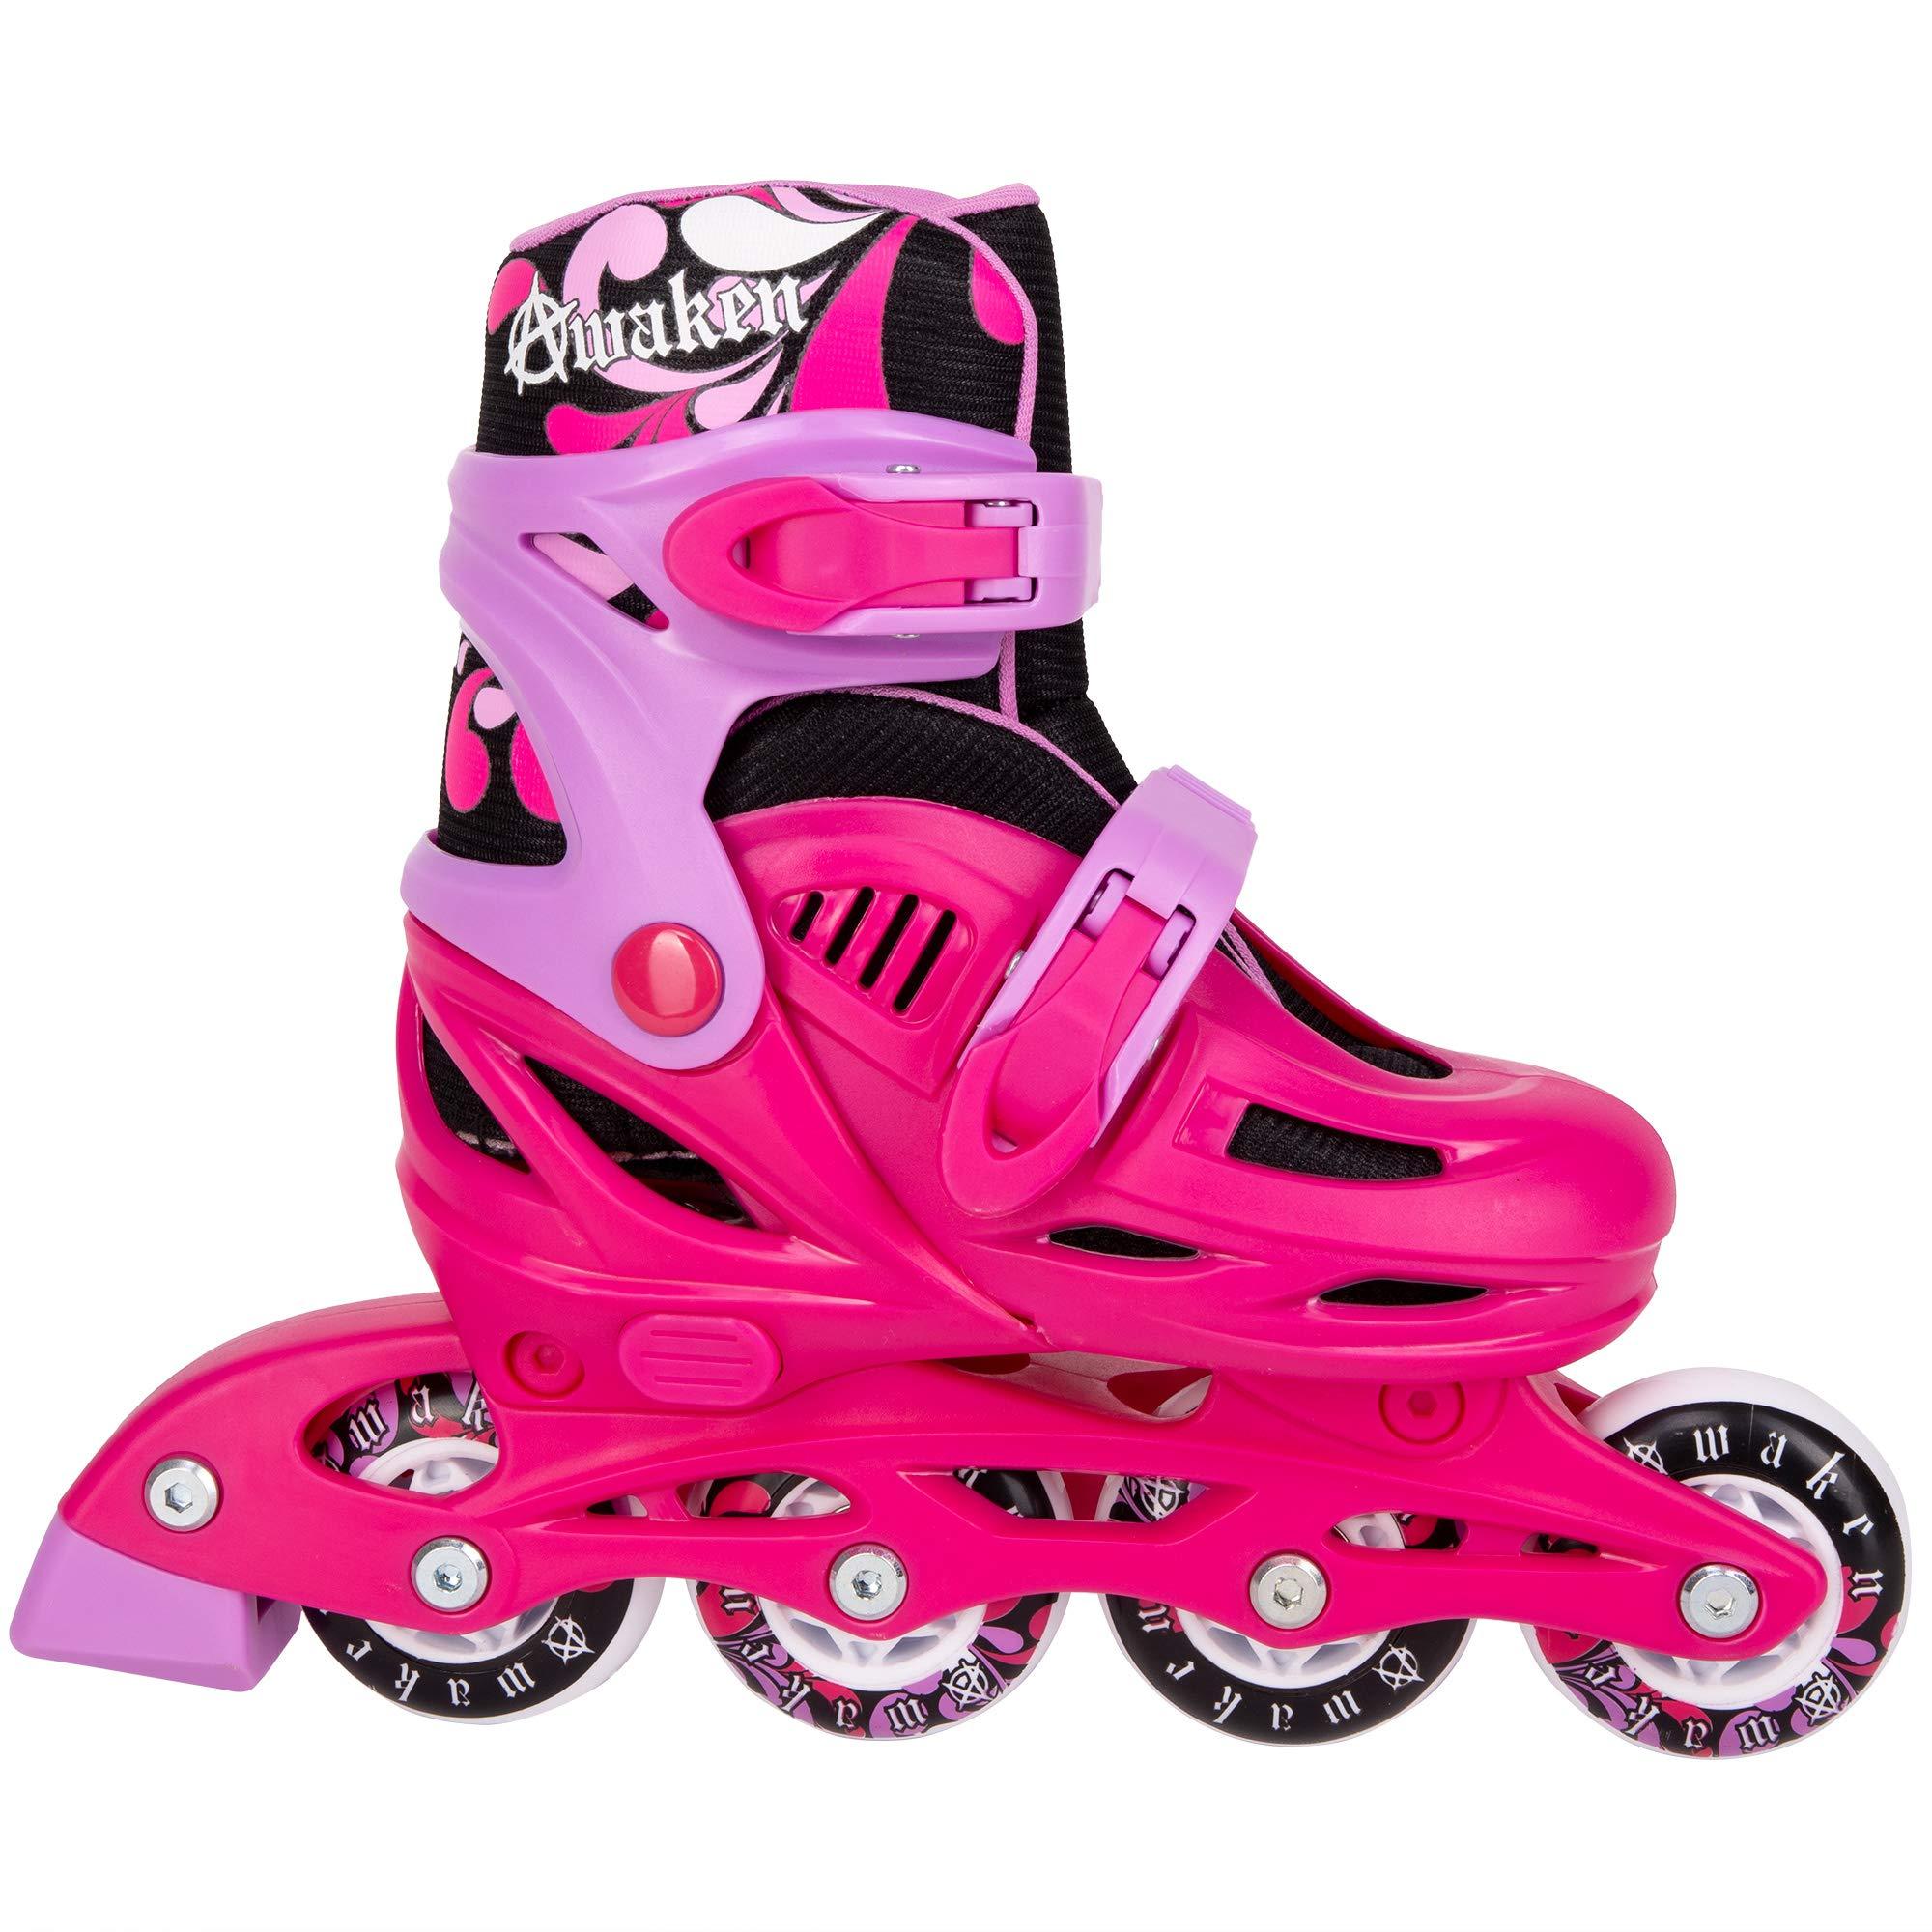 Cal 7 Adjustable Size Inline Skates | Beginner Roller Hockey Blades for Kids, Boys, Girls